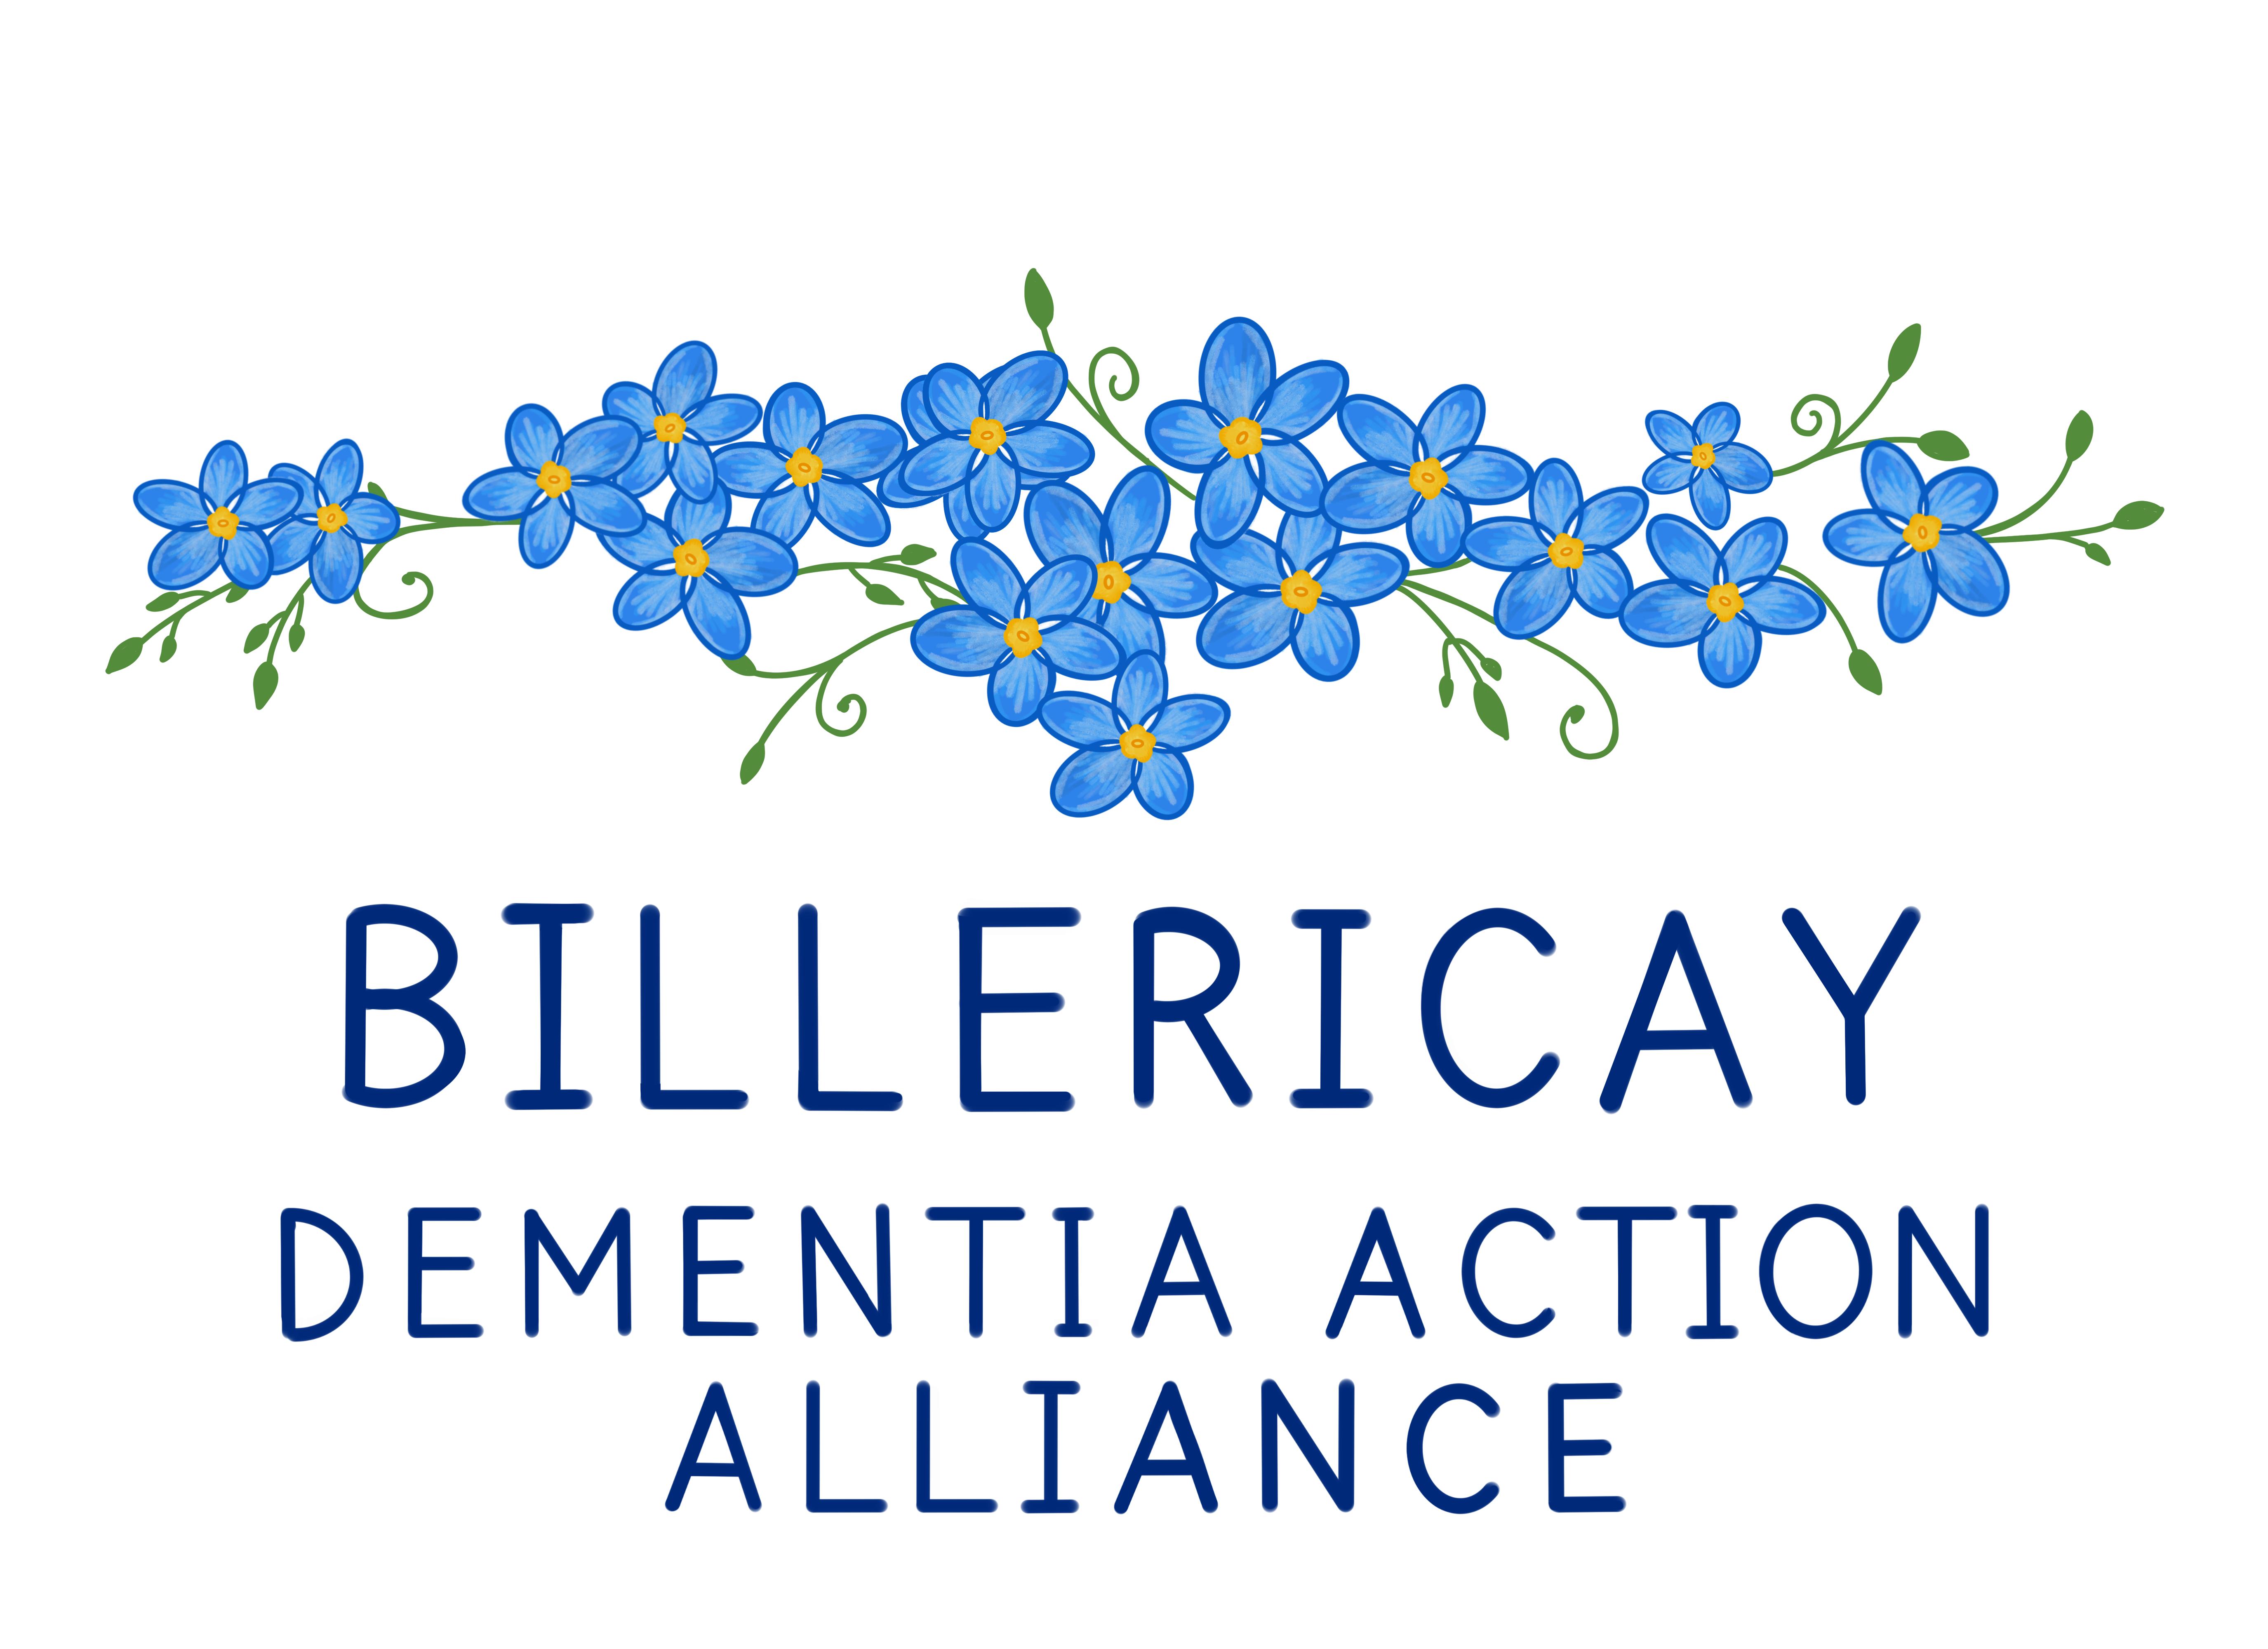 Billericay Dementia Action Alliance logo